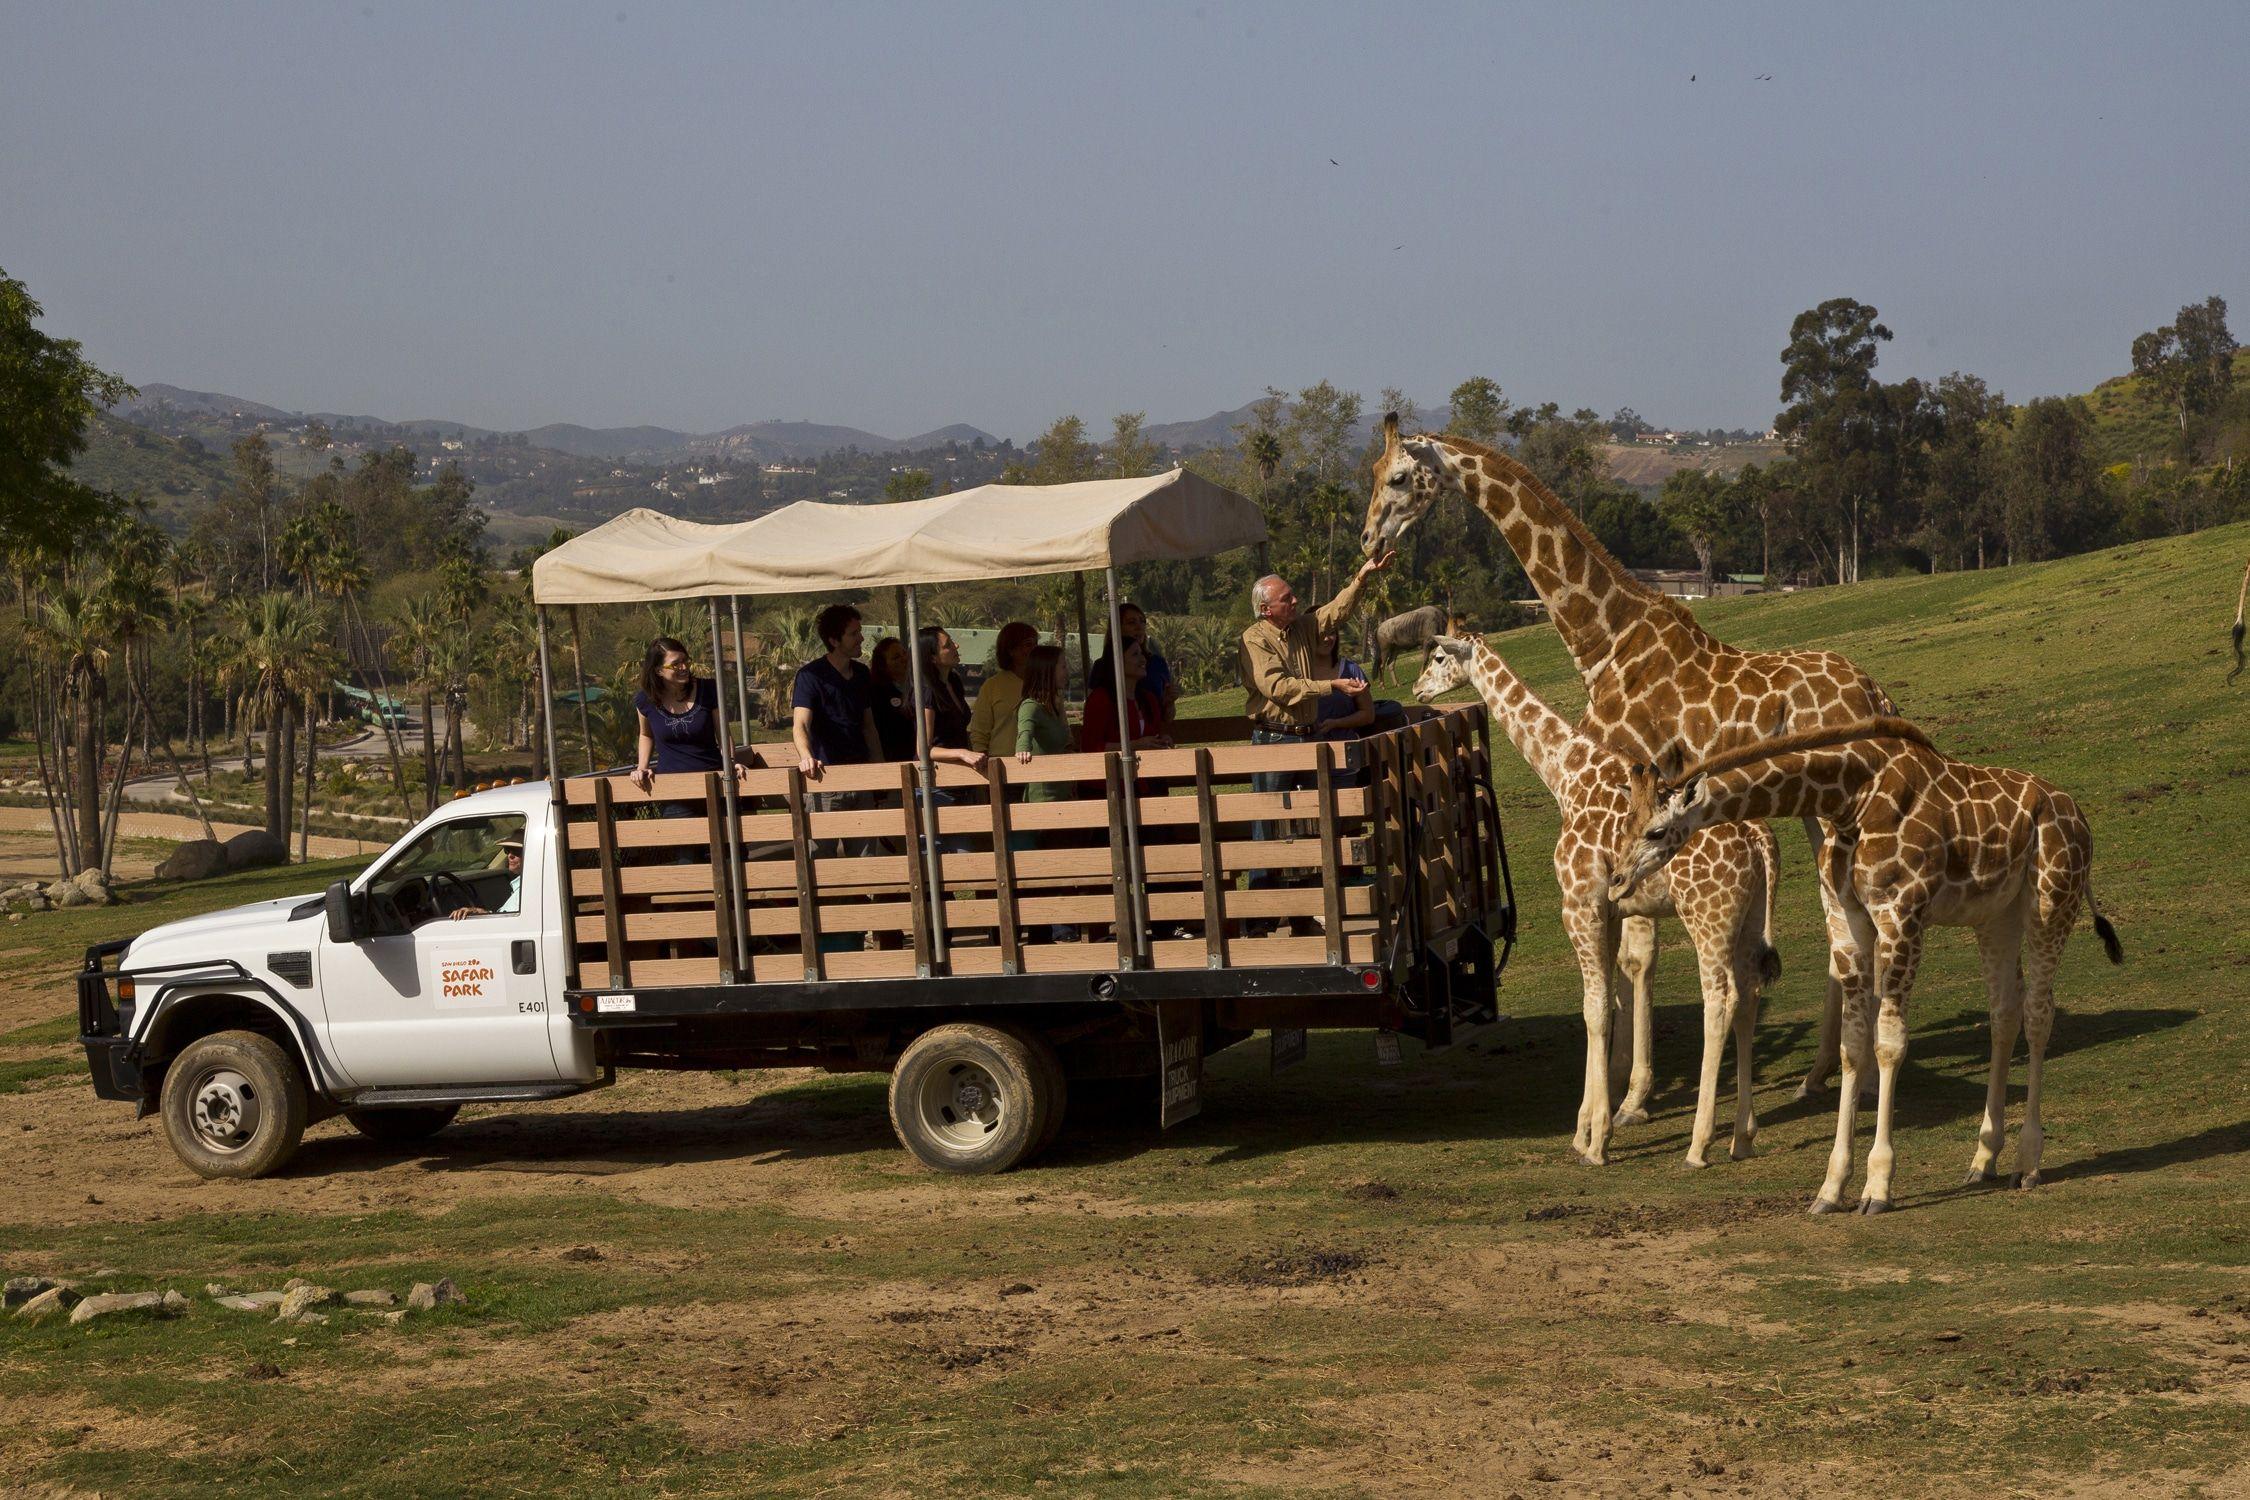 San Diego Zoo Safari Park Detailed Guide 2020 San Diego Zoo